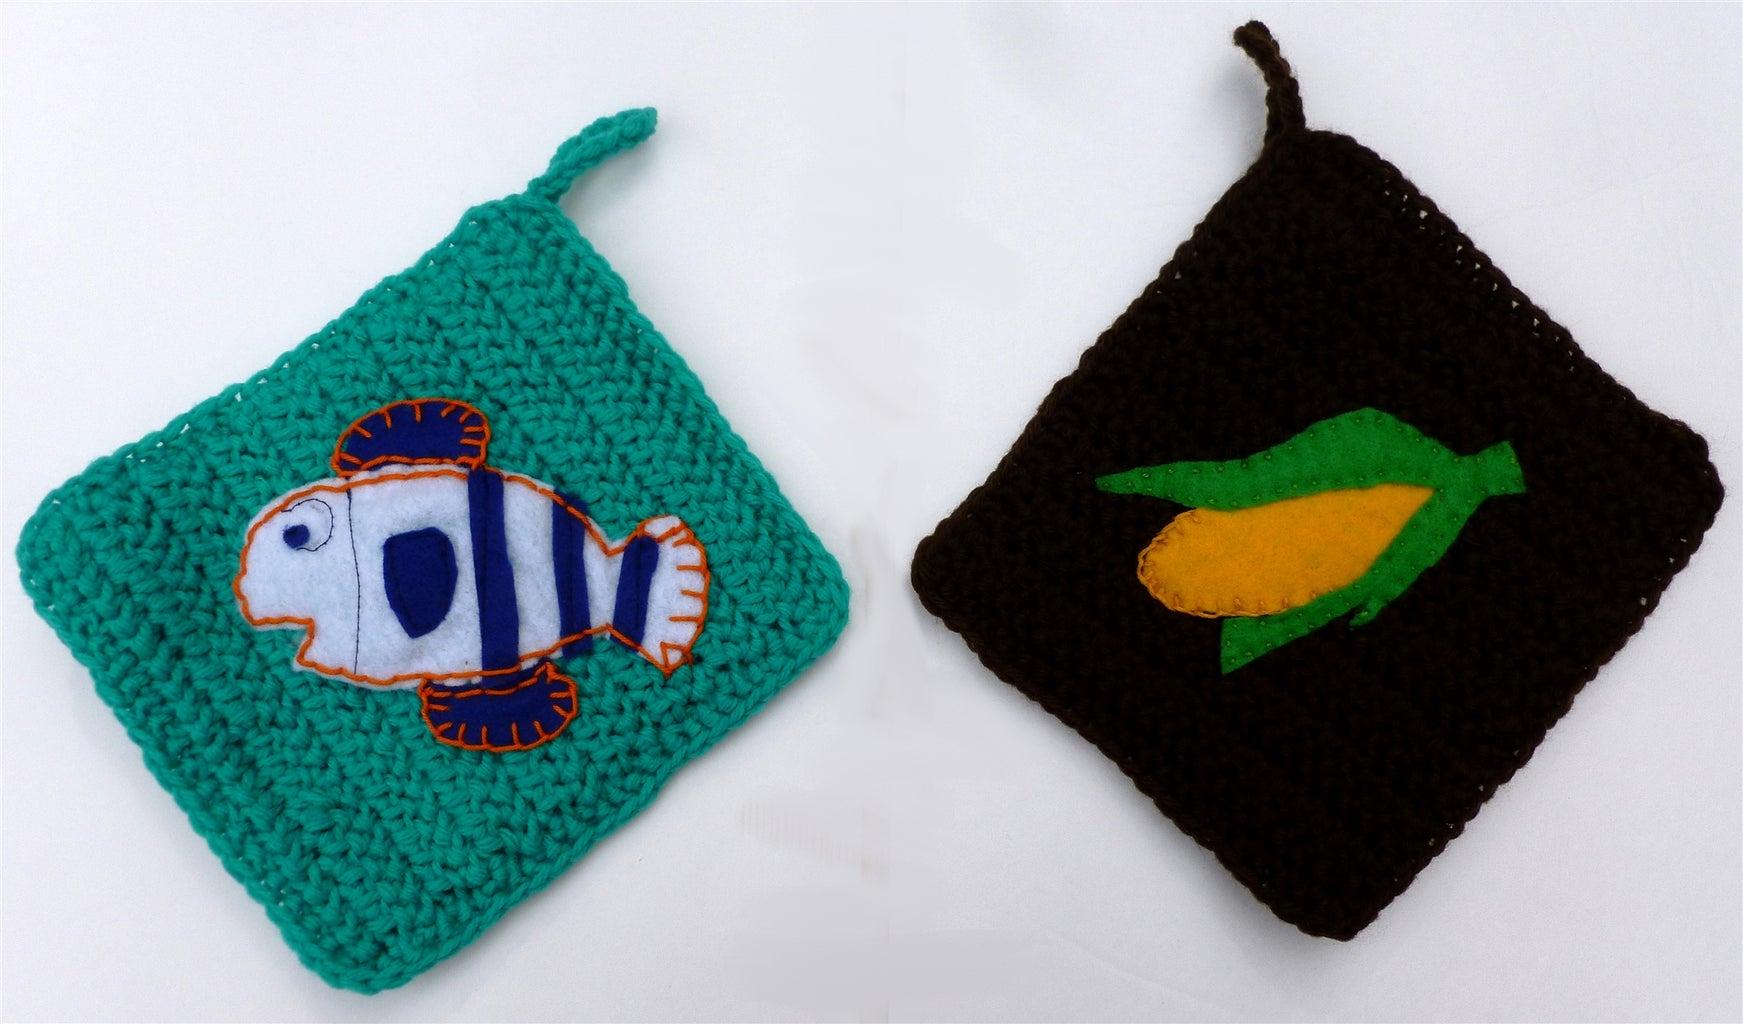 Crochet Potholder - Row Pattern